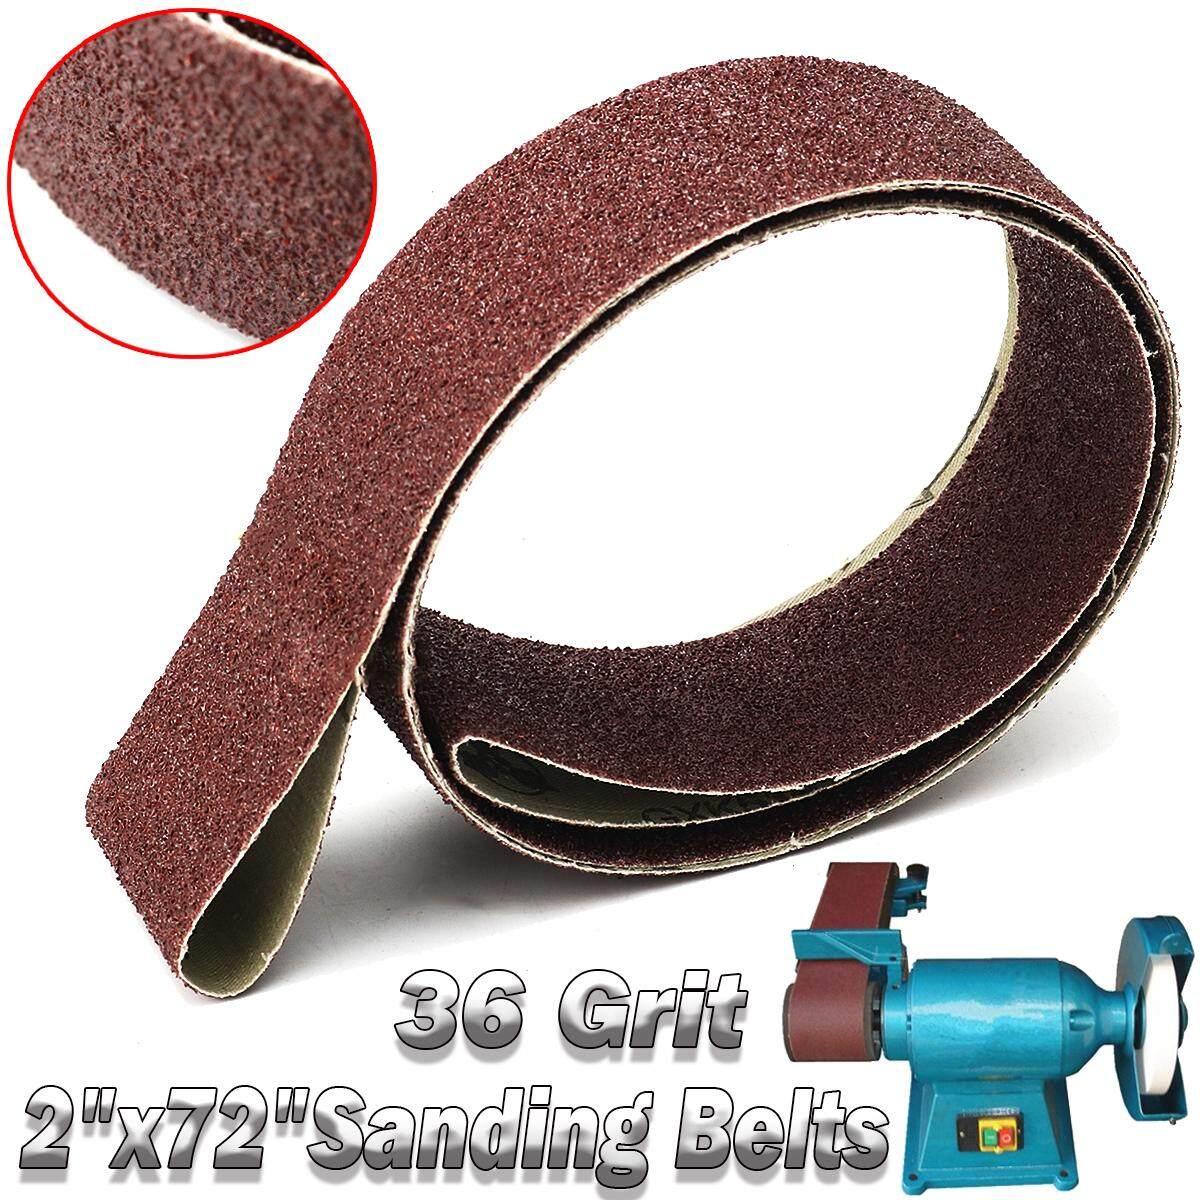 1PC Aluminum Oxide 2 x 72 Sanding Belts 36 Grit Sharpening Oxide Abrasive Strips